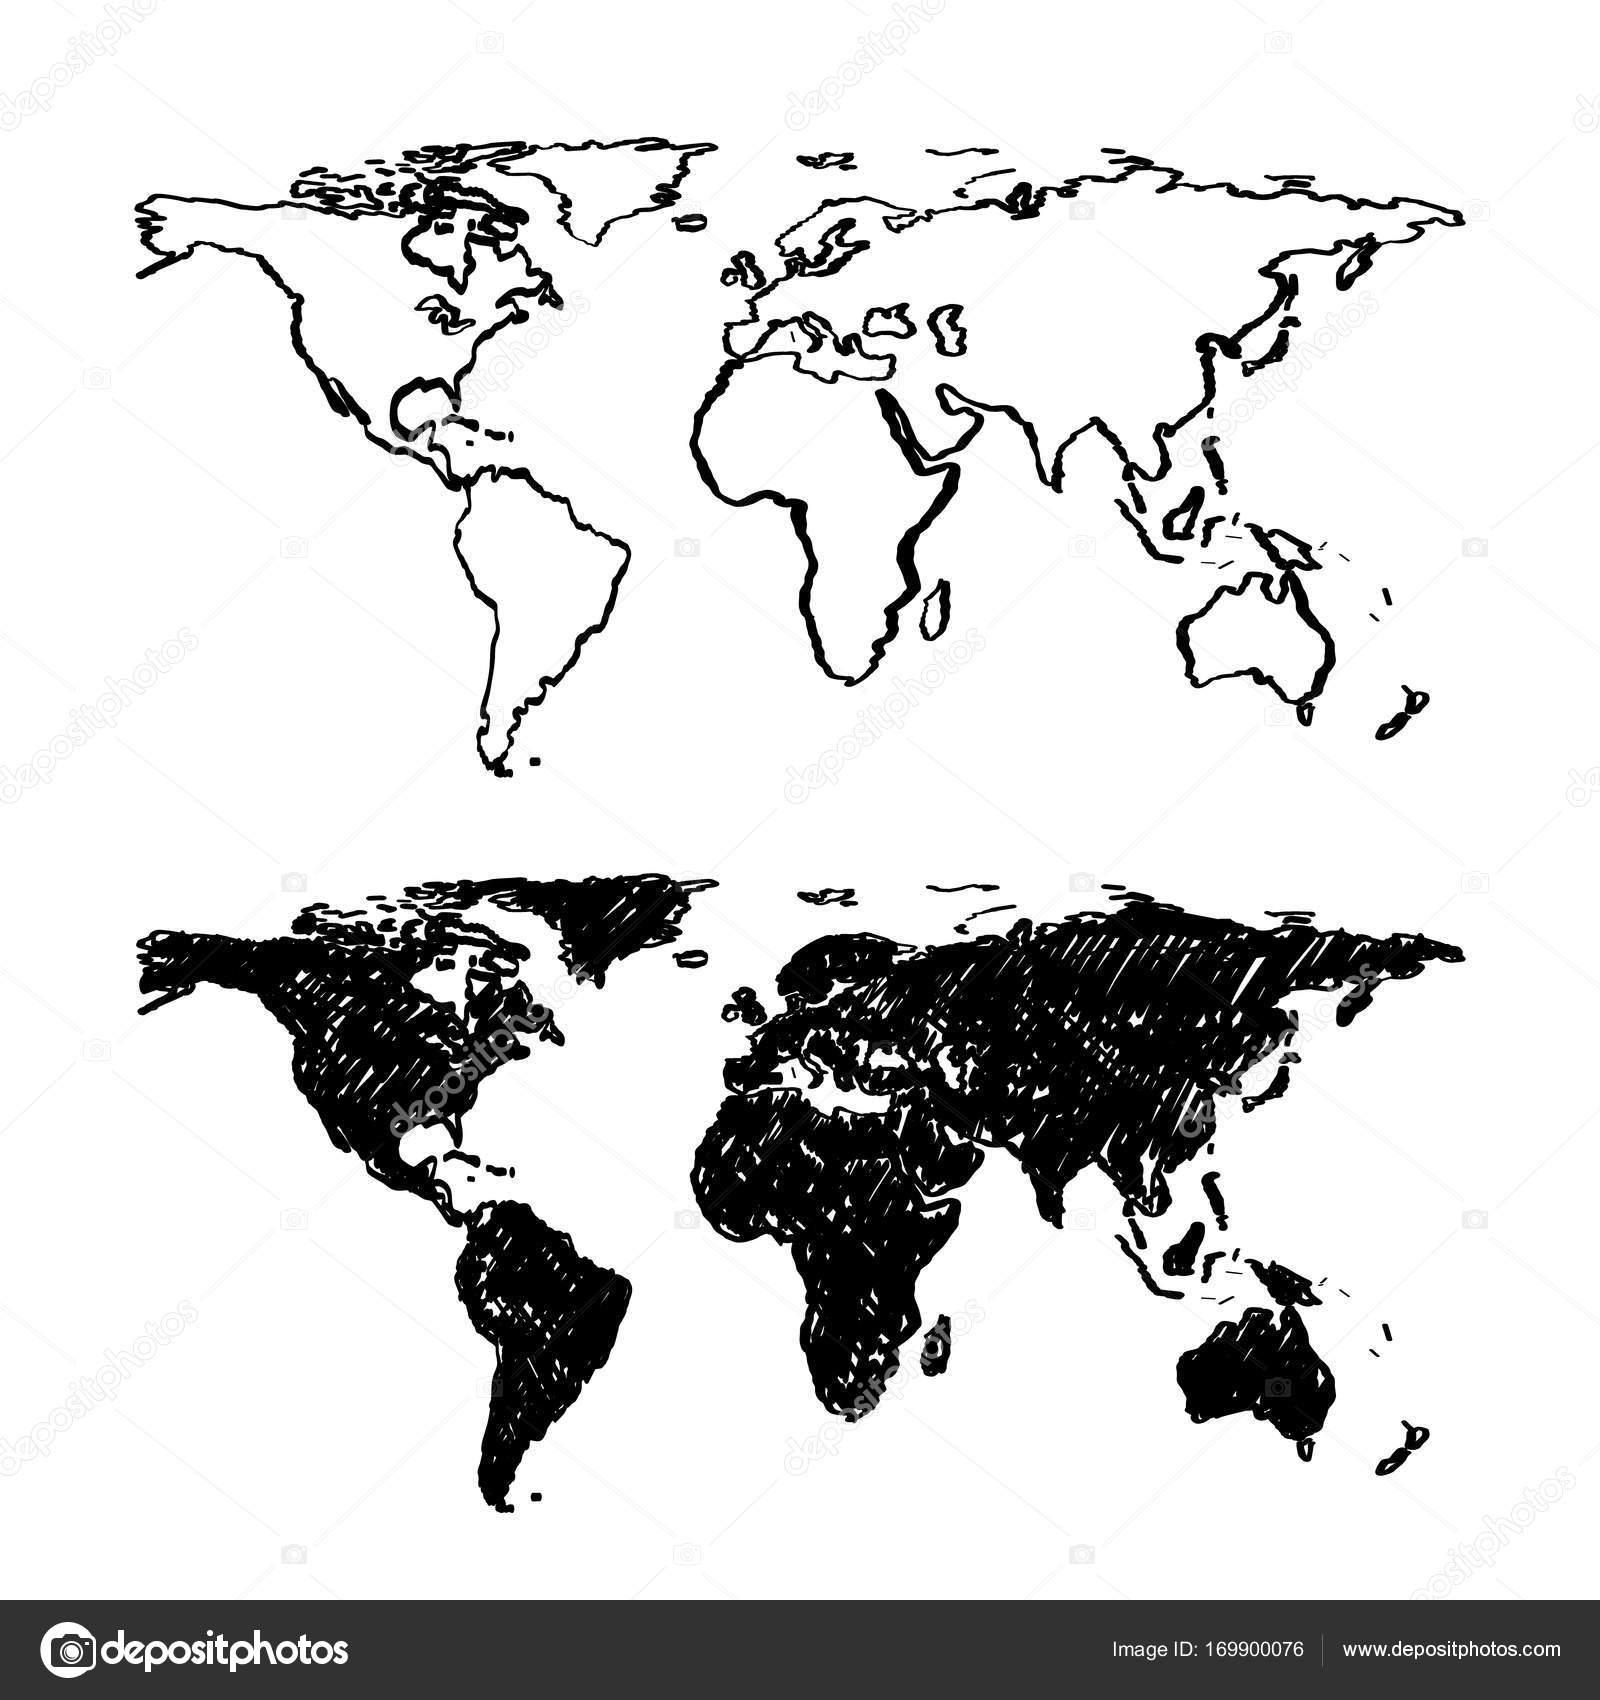 Sketch of hand drawn World map. — Stock Vector © hobbit_art #169900076